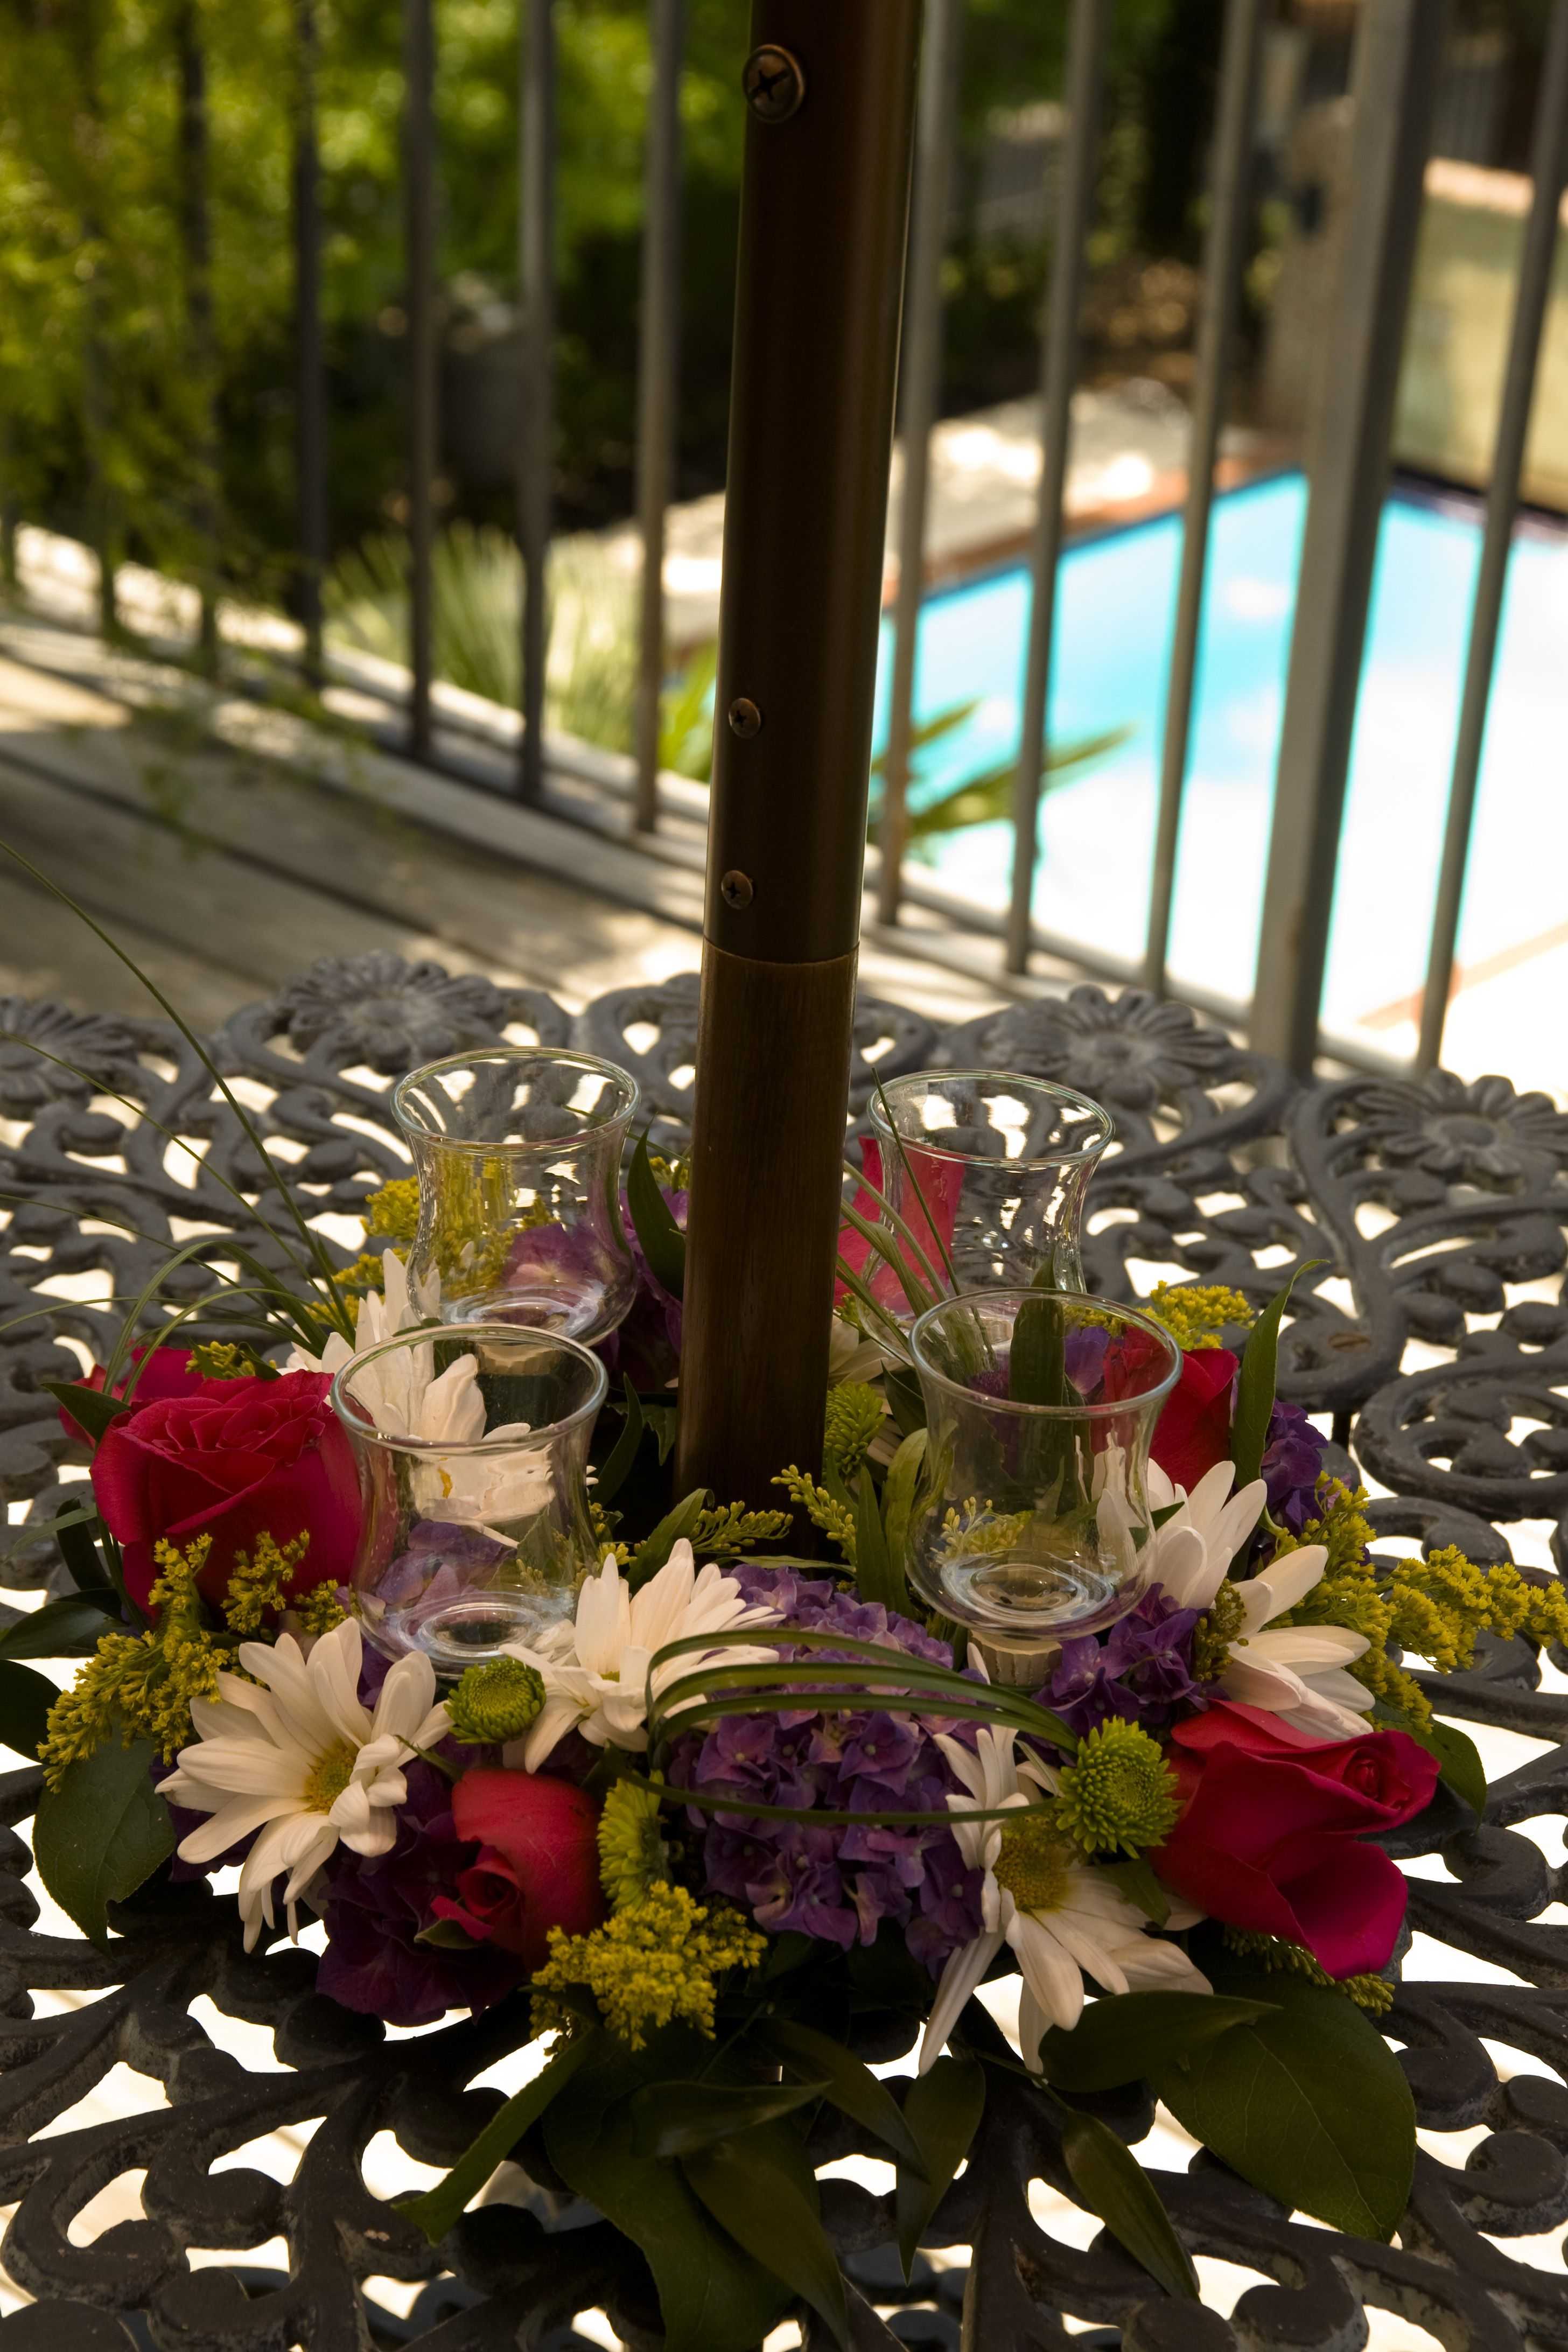 Summer Flower Arrangements By Twigs In Greenville Sc Summer Flower Arrangements Flower Arrangements Flower Delivery